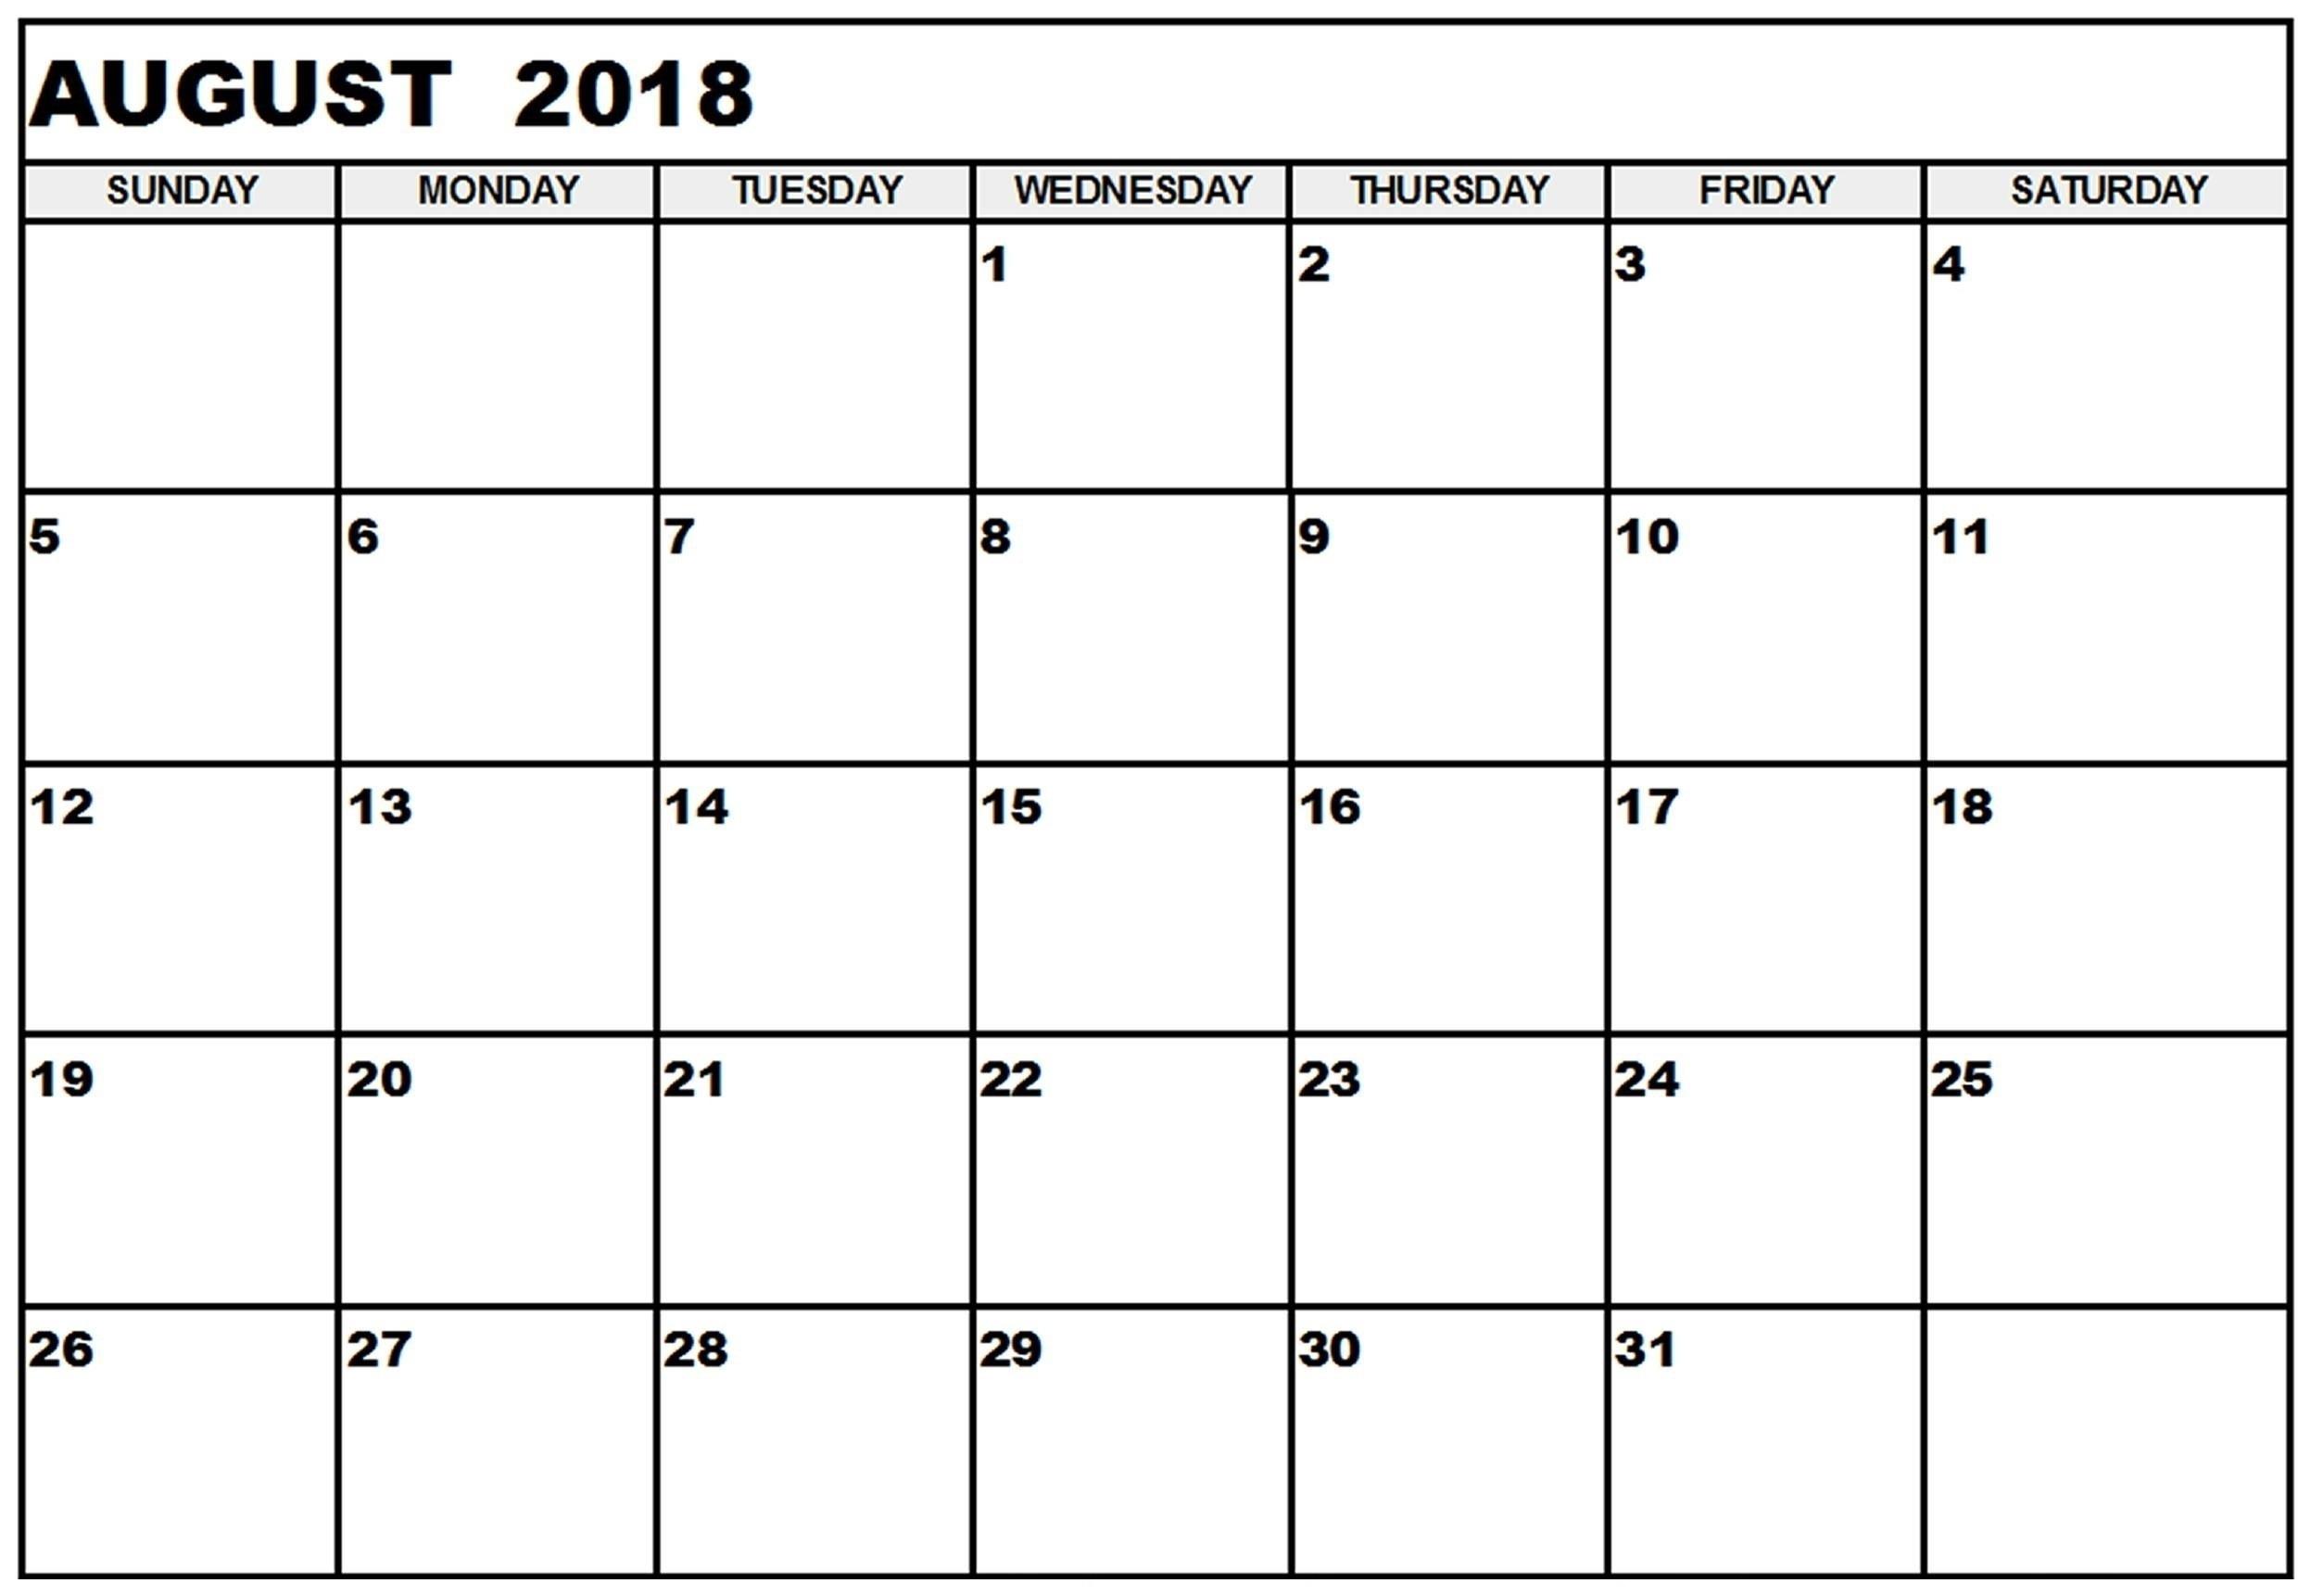 august 2018 free printable calendar calendar printable with Free Pretty Printable Calendars August 2018 erdferdf